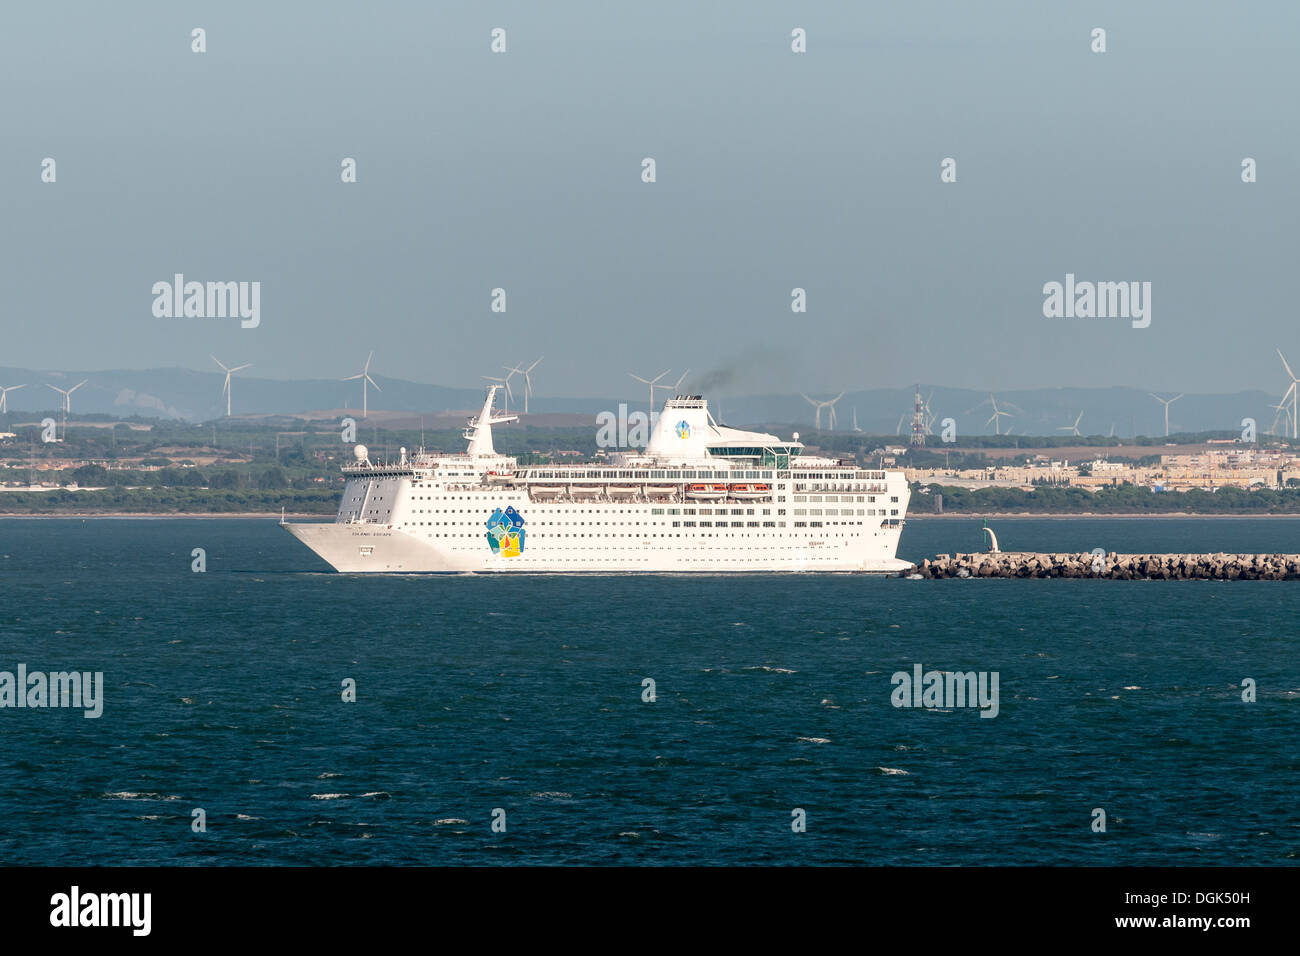 Island cruises, Island Escape cruise ship. Cruising the Mediterranean Sea, Europe - Stock Image